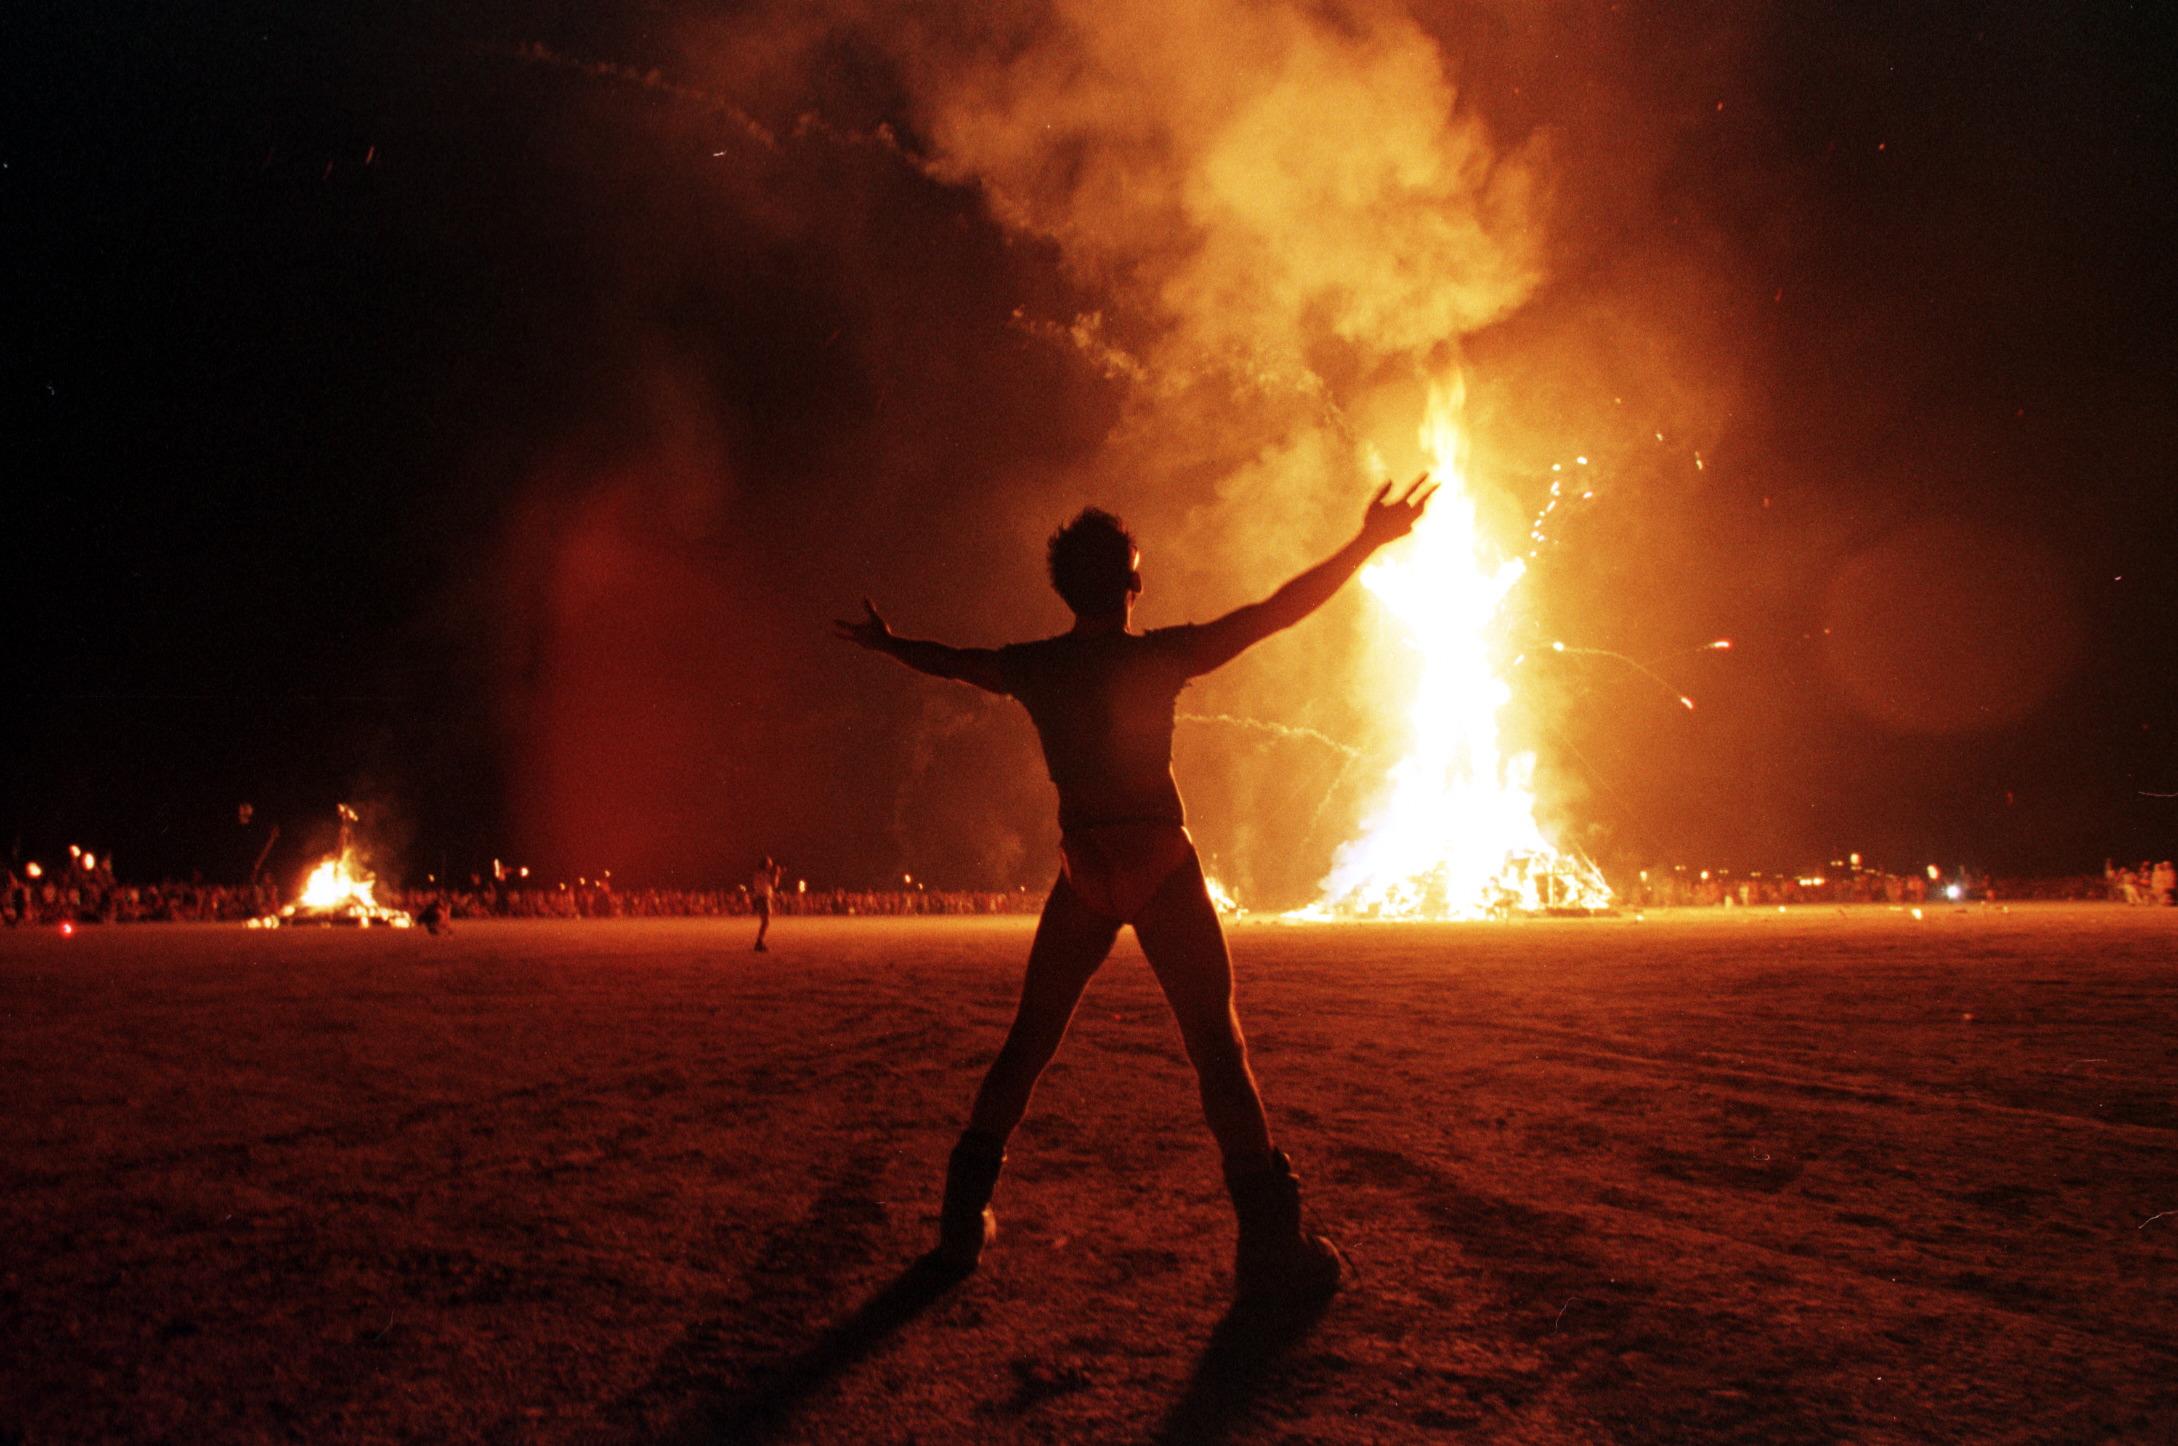 Perceived One Percenters Were Sabotaged at Burning Man Last Week ...